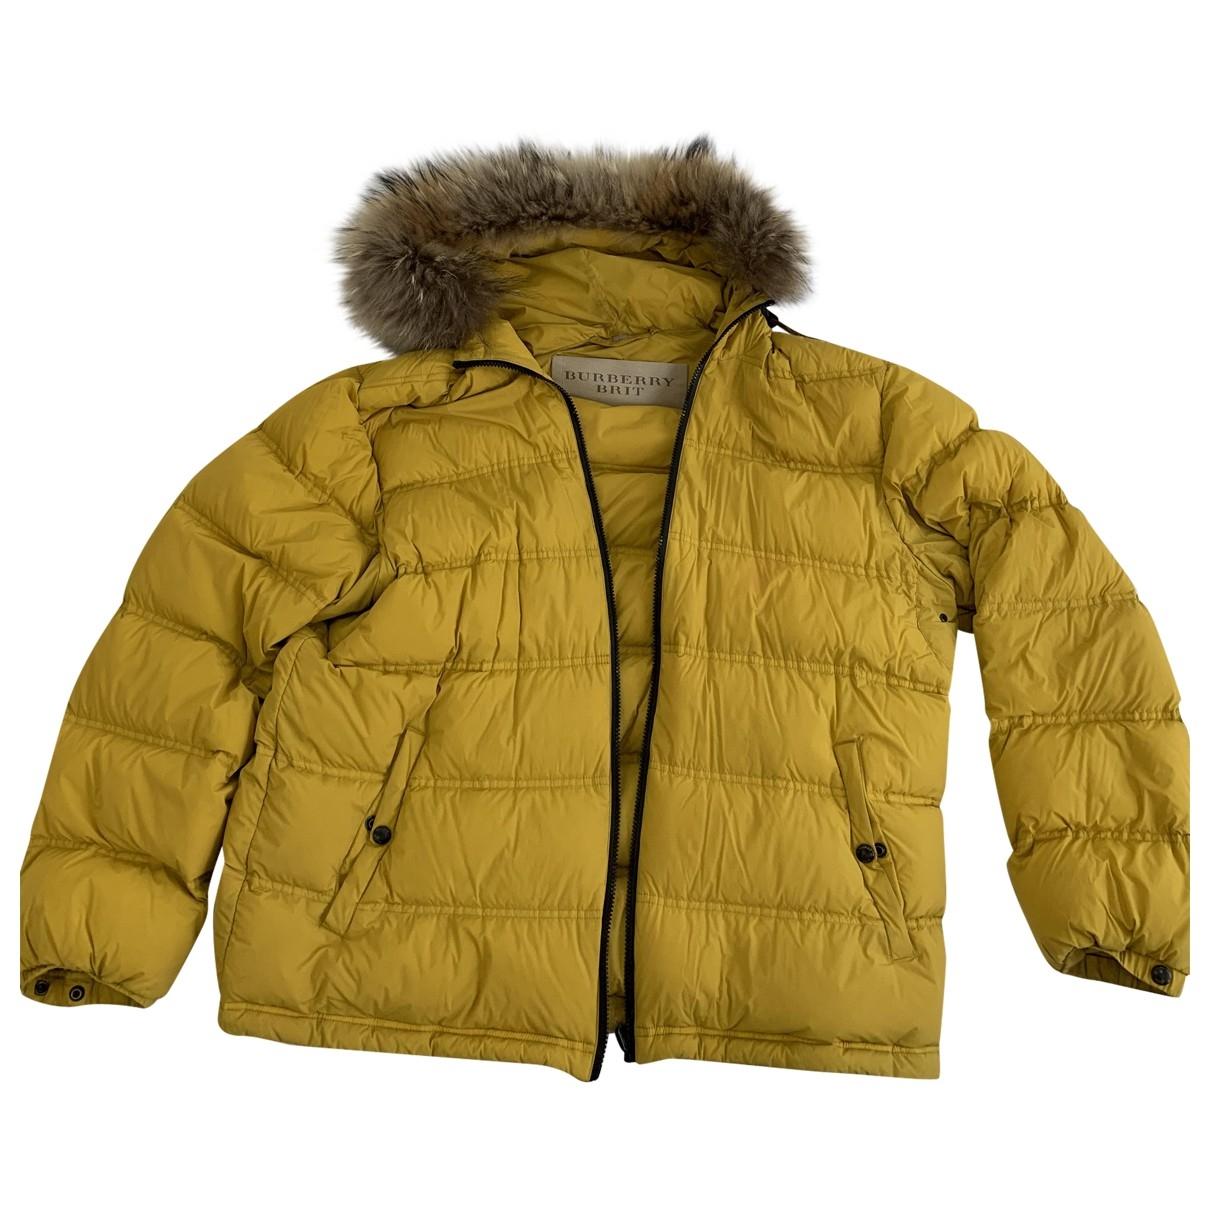 Burberry \N Yellow coat  for Men XL International